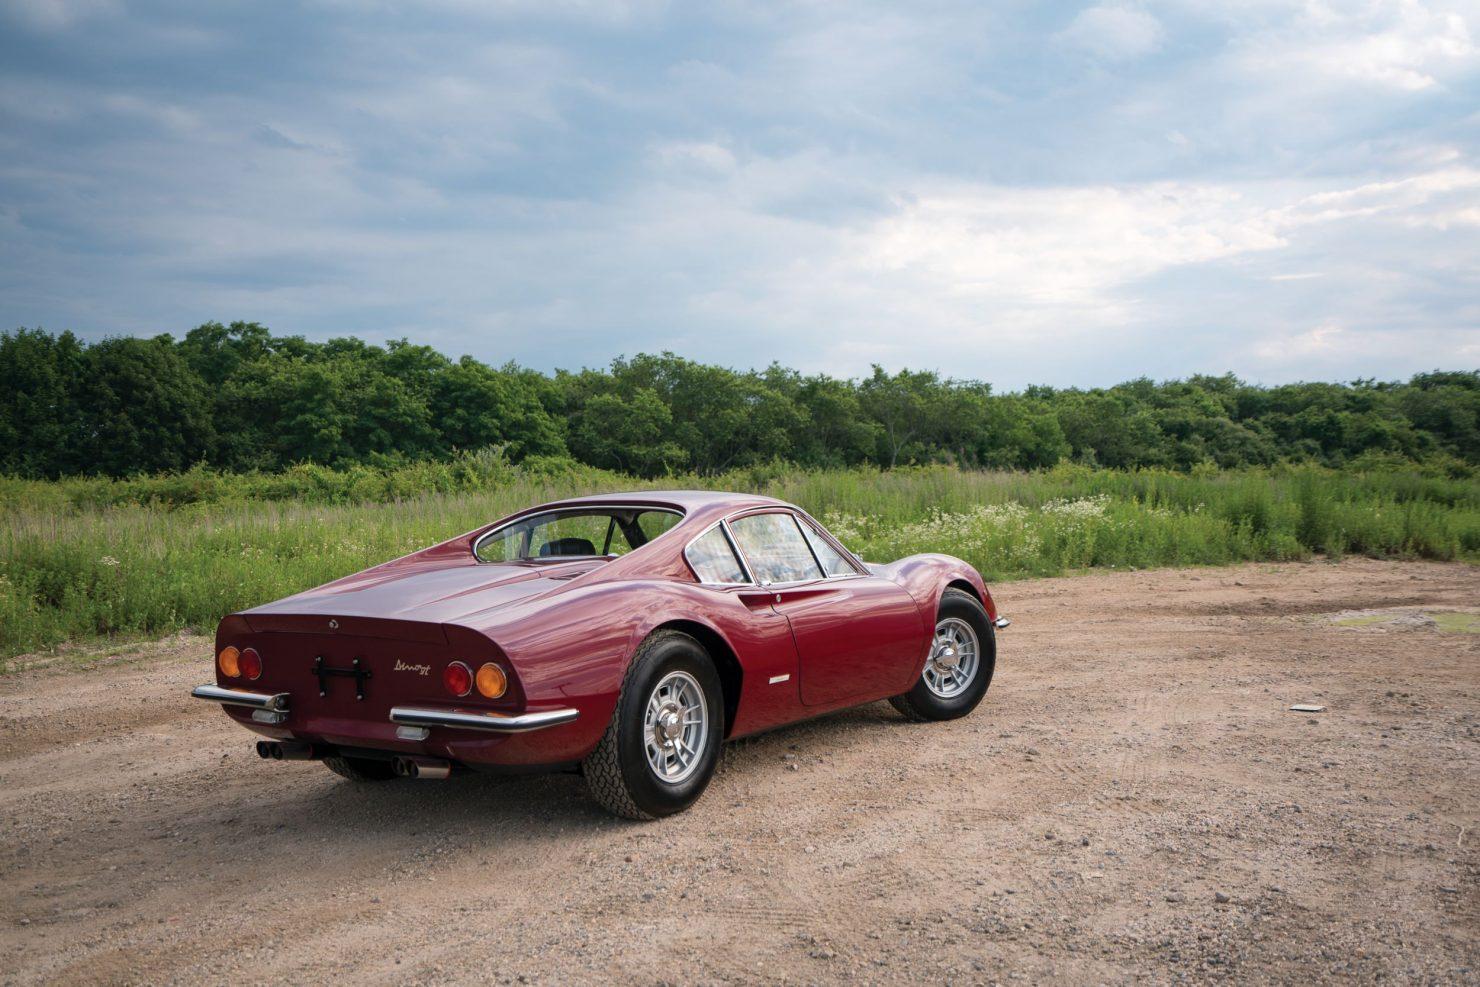 ferrari dino 246 22 1480x987 - 1969 Ferrari Dino 246 GT